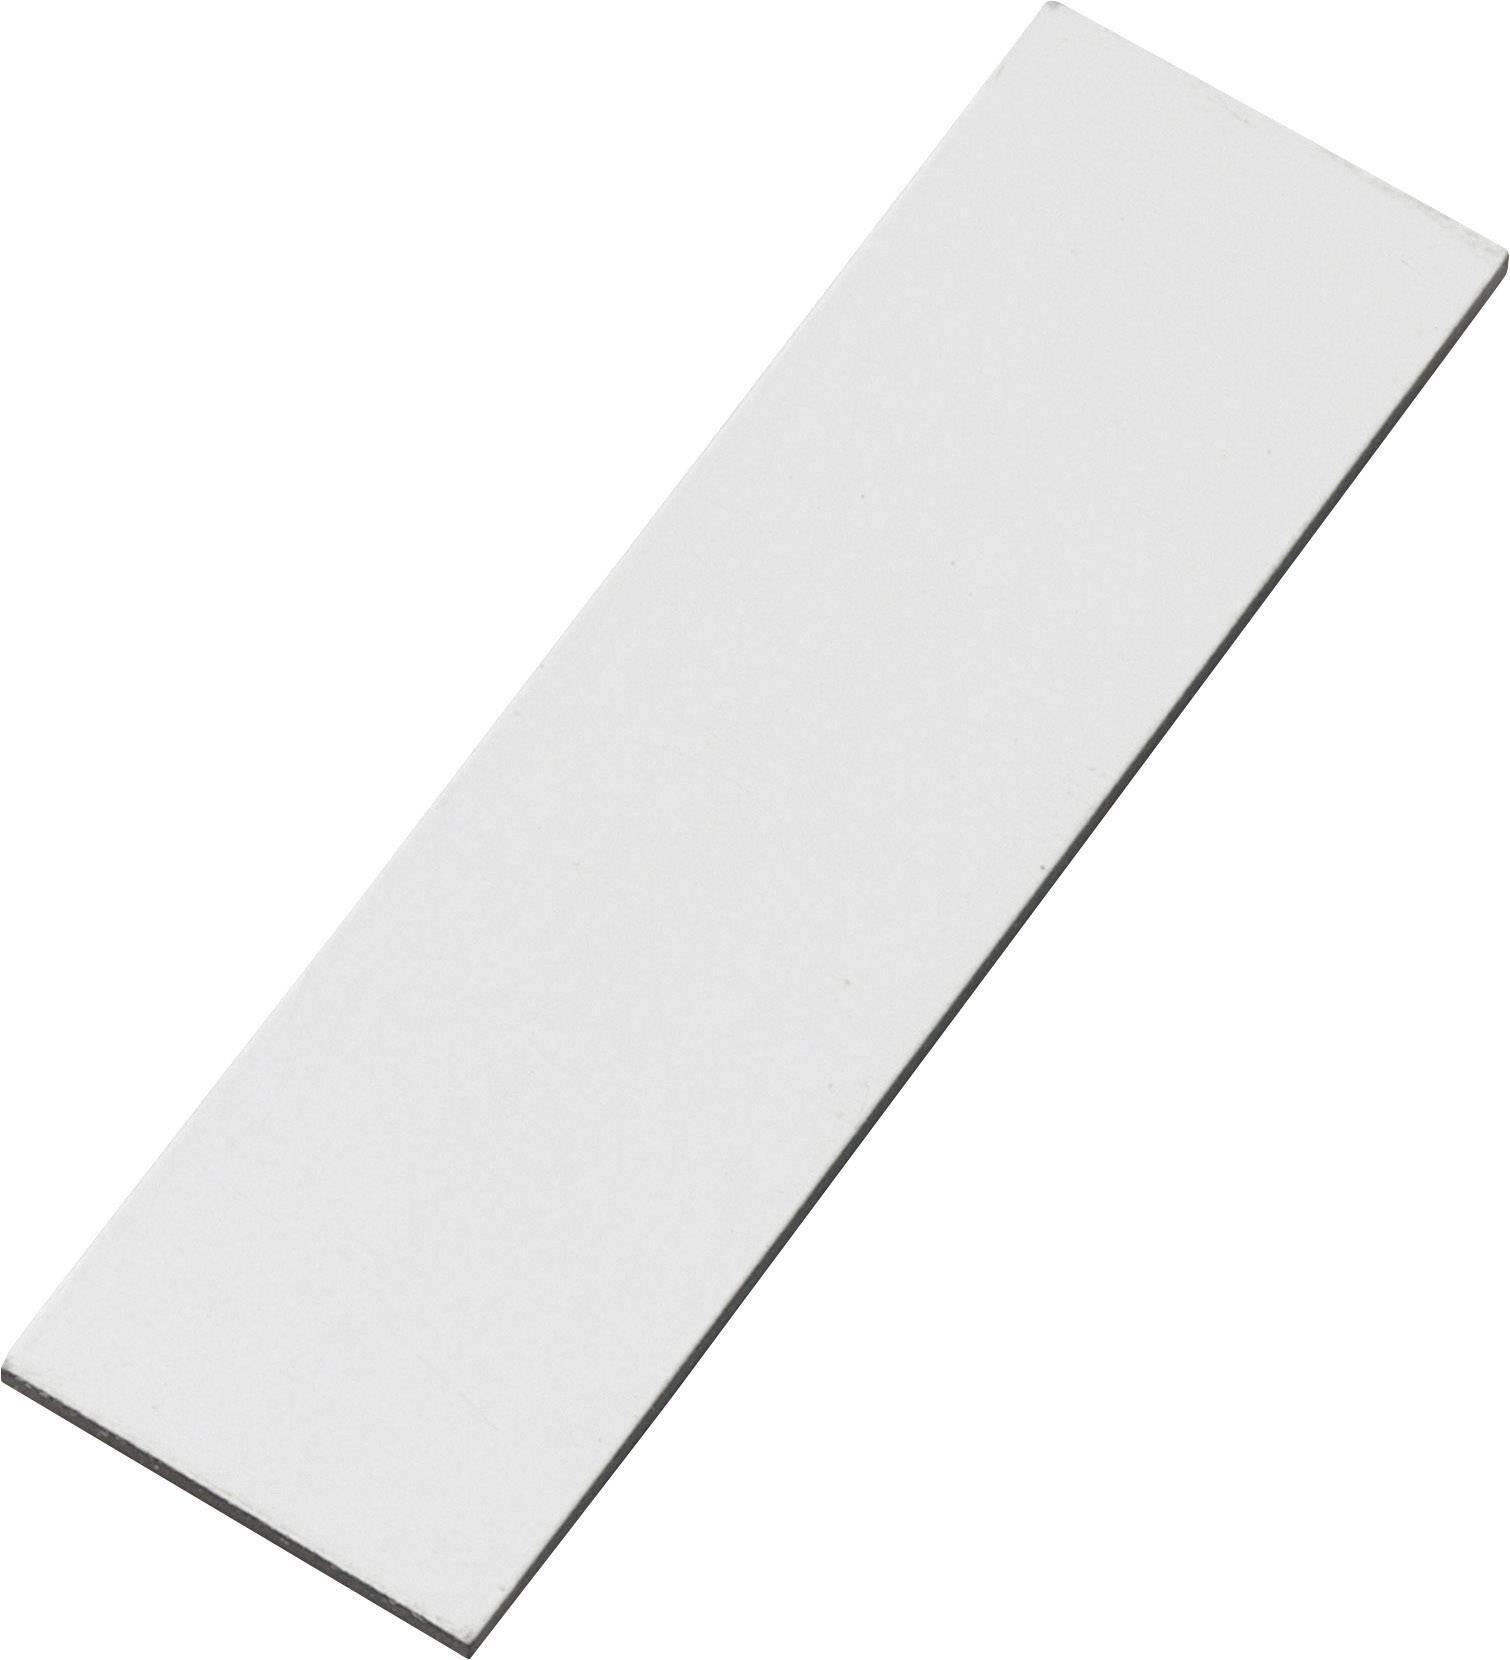 Magnetická podložka s bílou popisnou plochou Conrad 549931, 66 mm x 20 mm